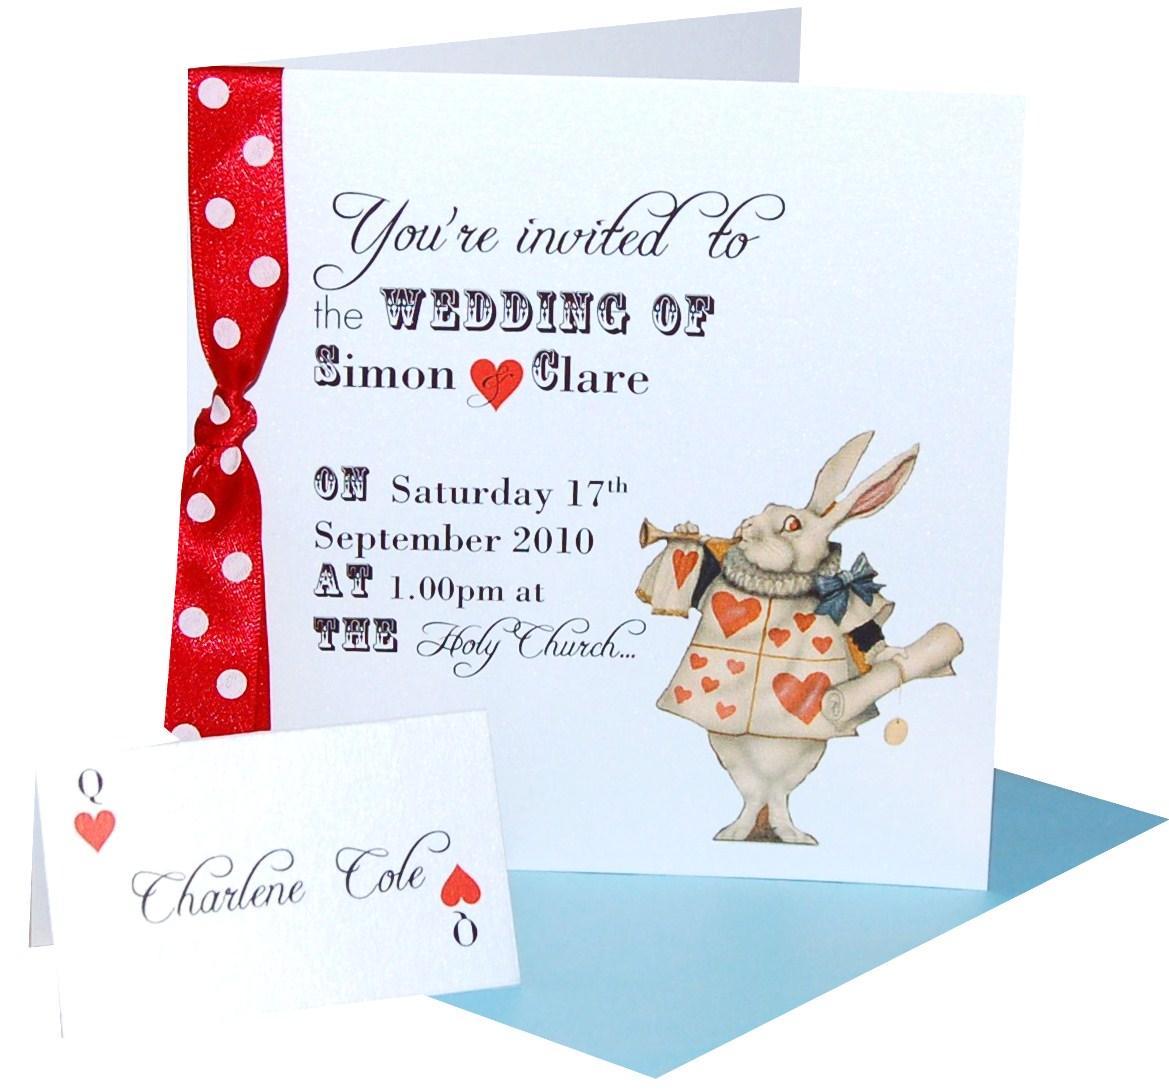 Winter Wonderland Wedding Invitations Inspiring Winter Wonderland Wedding  Invitations Inspiring Alice Wonderland Wedding Theme Fantastical Stylings